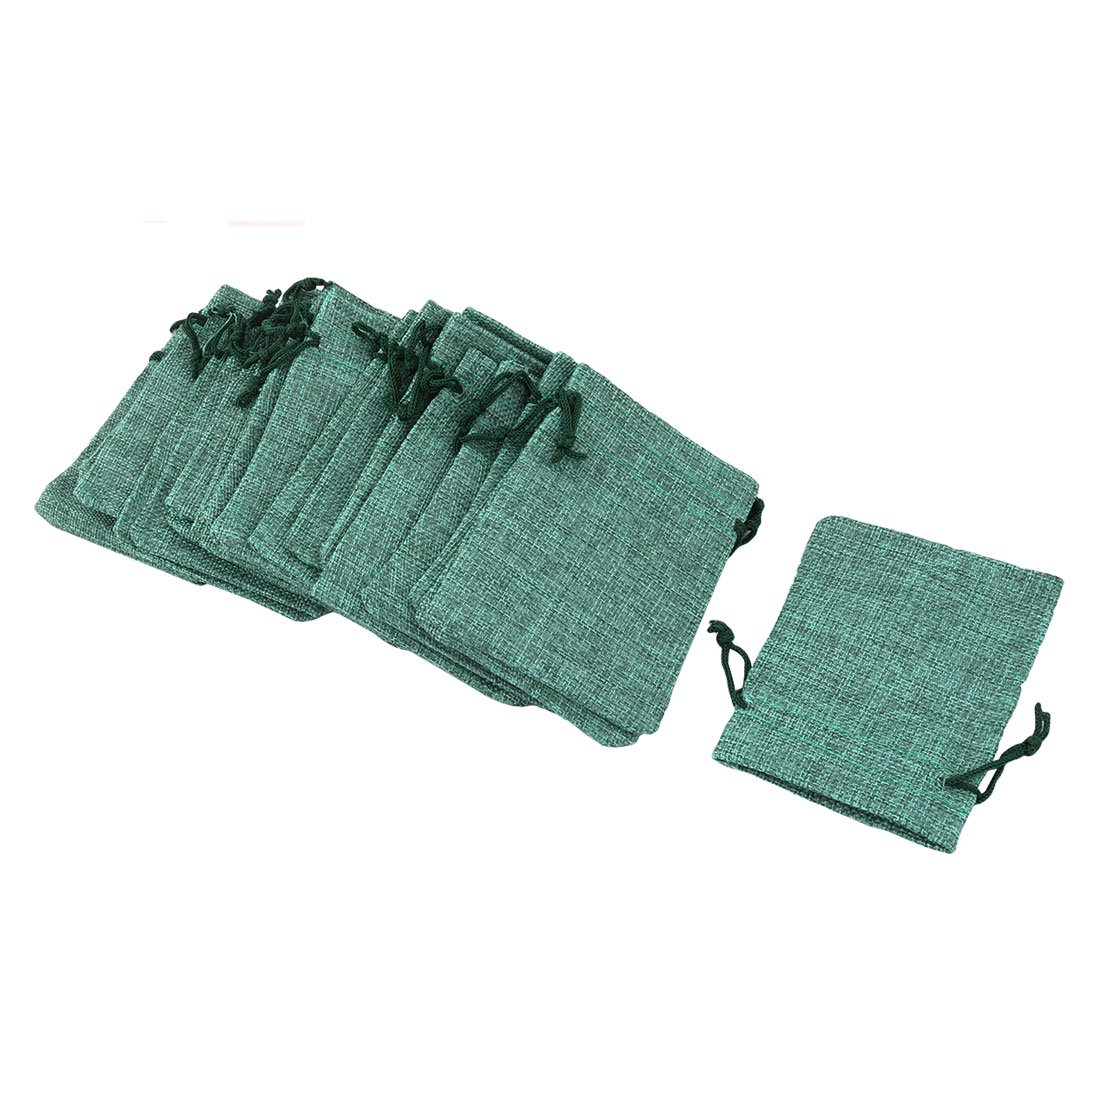 uxcell Cotton Linen Outdoor Jewelry Ring Button Holder Drawstring Bag 25pcs Dark Green